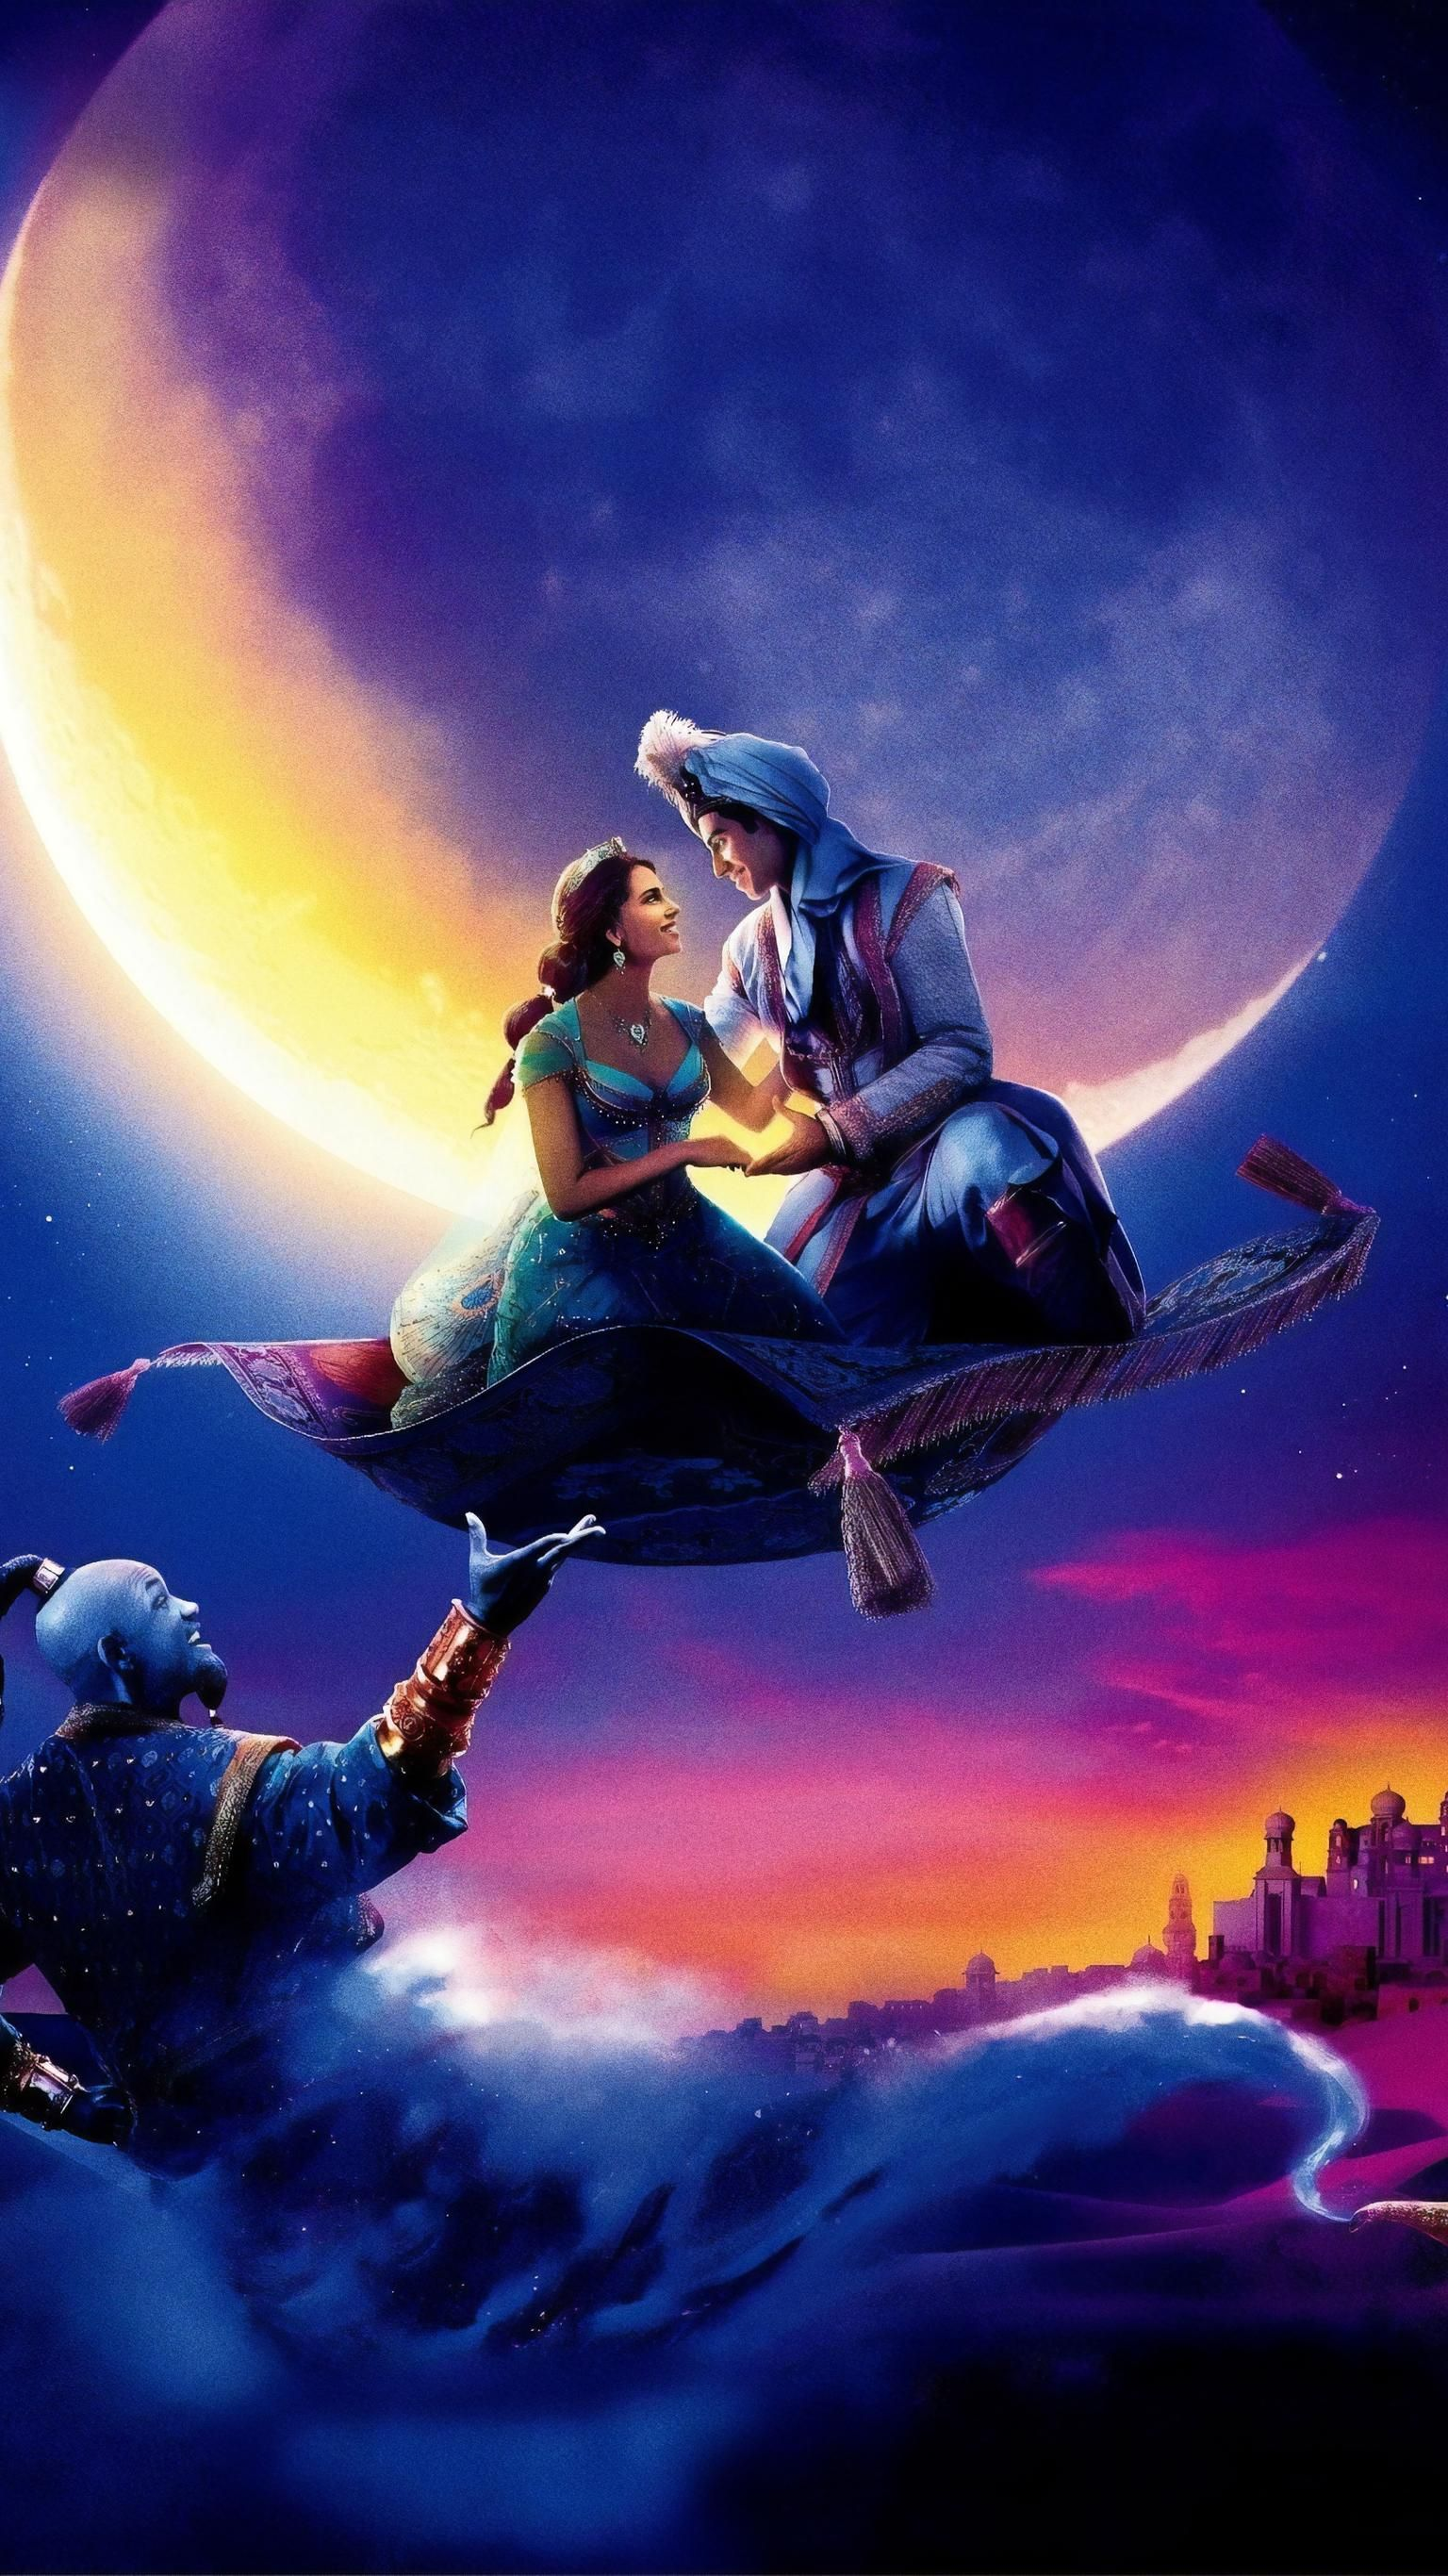 Aladdin (2019) Phone Wallpaper Aladdin wallpaper, Disney